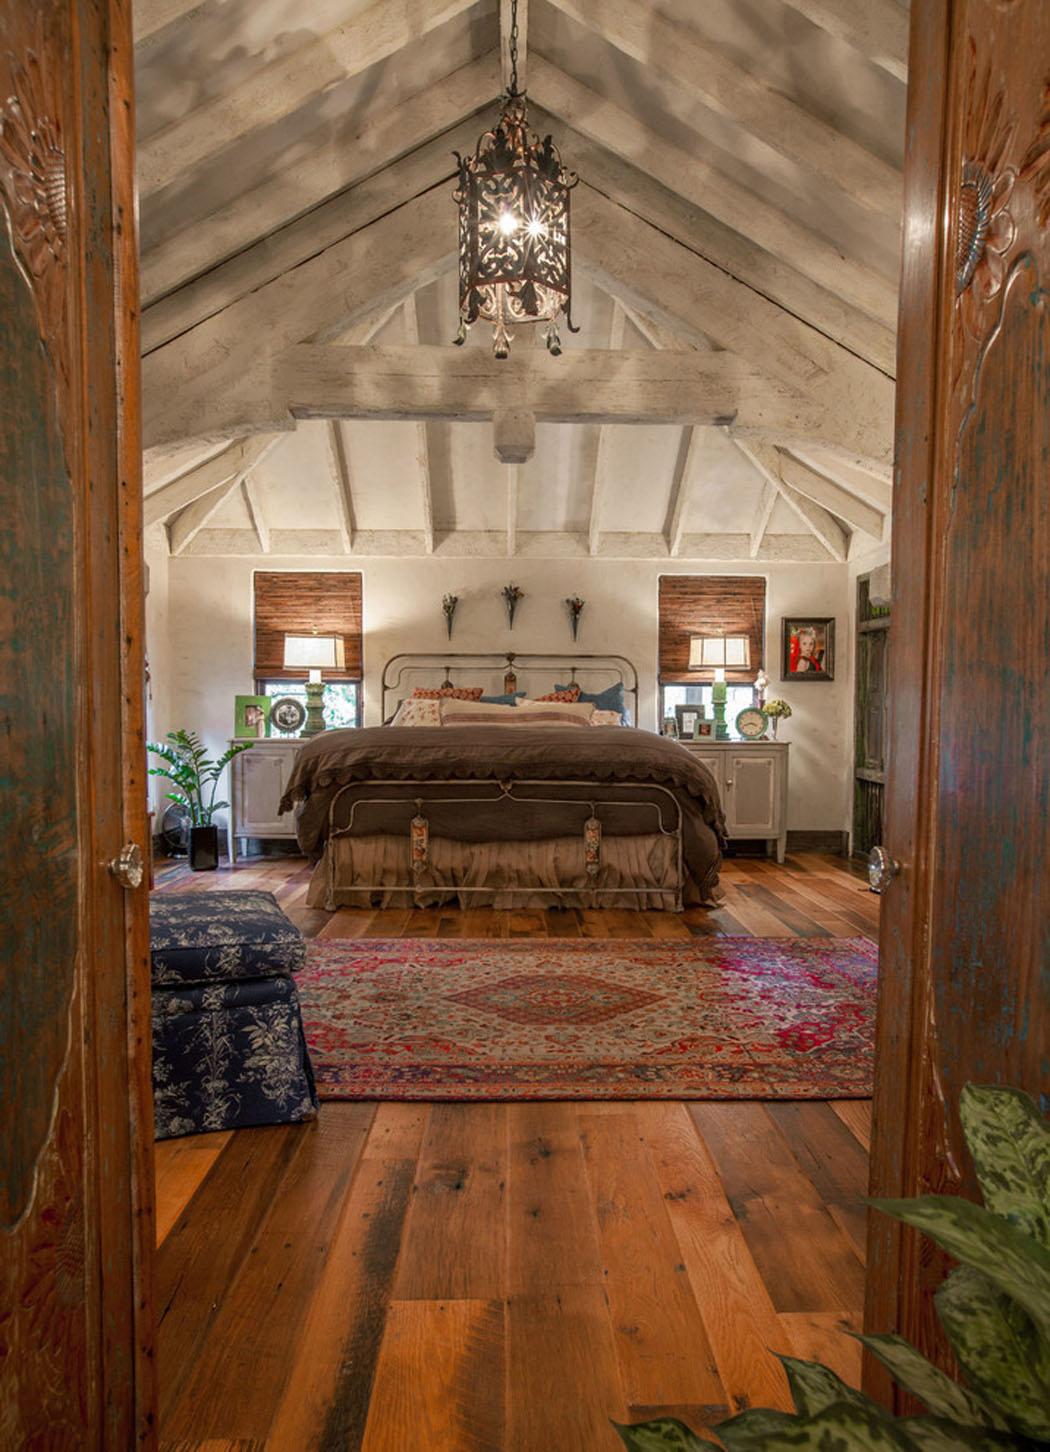 Deco Chambre Avec Poutre Apparente Maison Design Edfoscom - Deco maison avec poutre